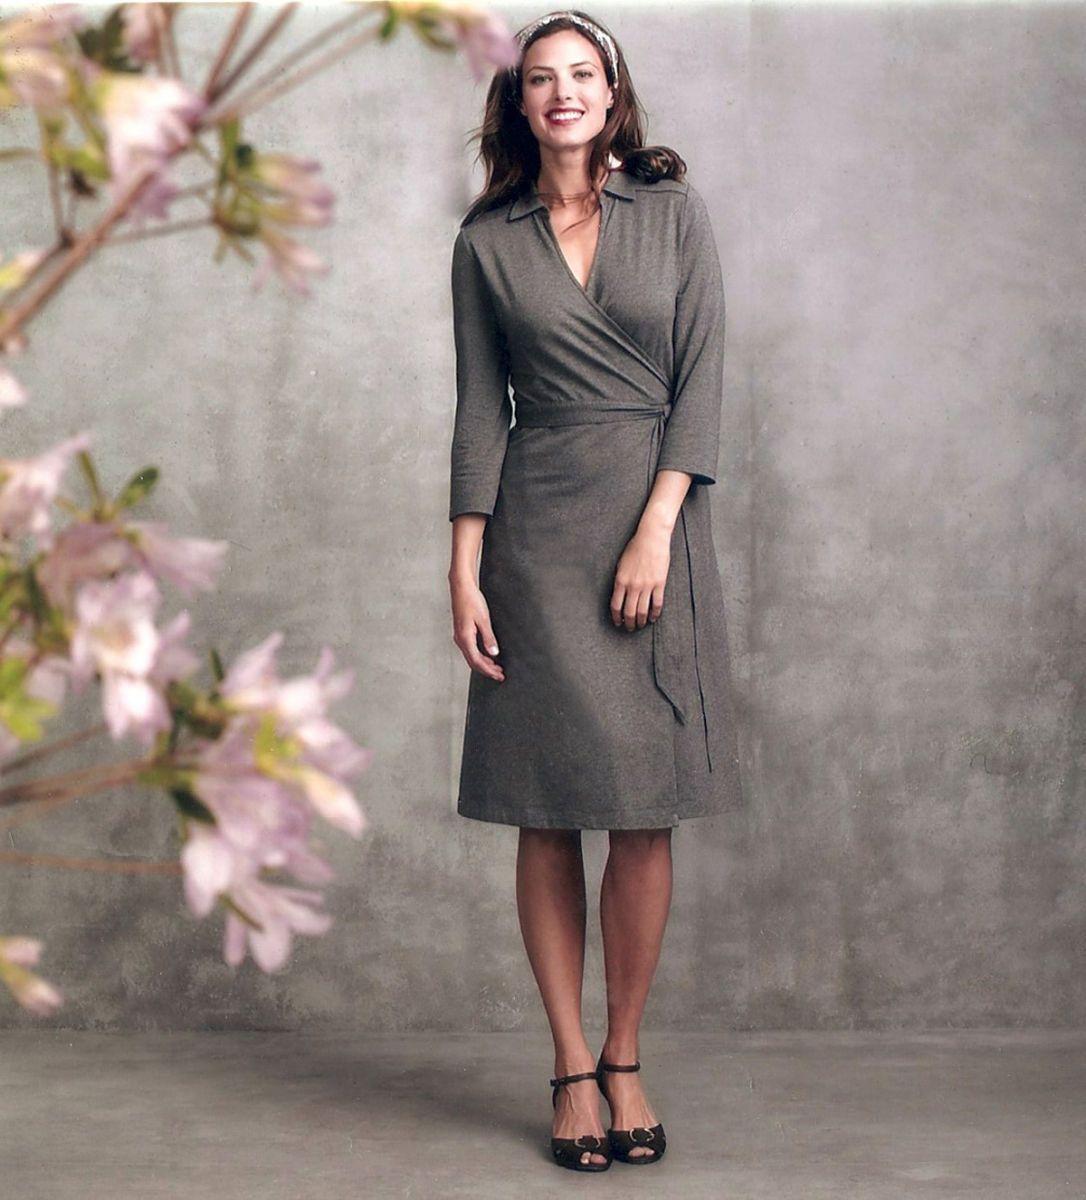 1susan_grey_dress.jpg